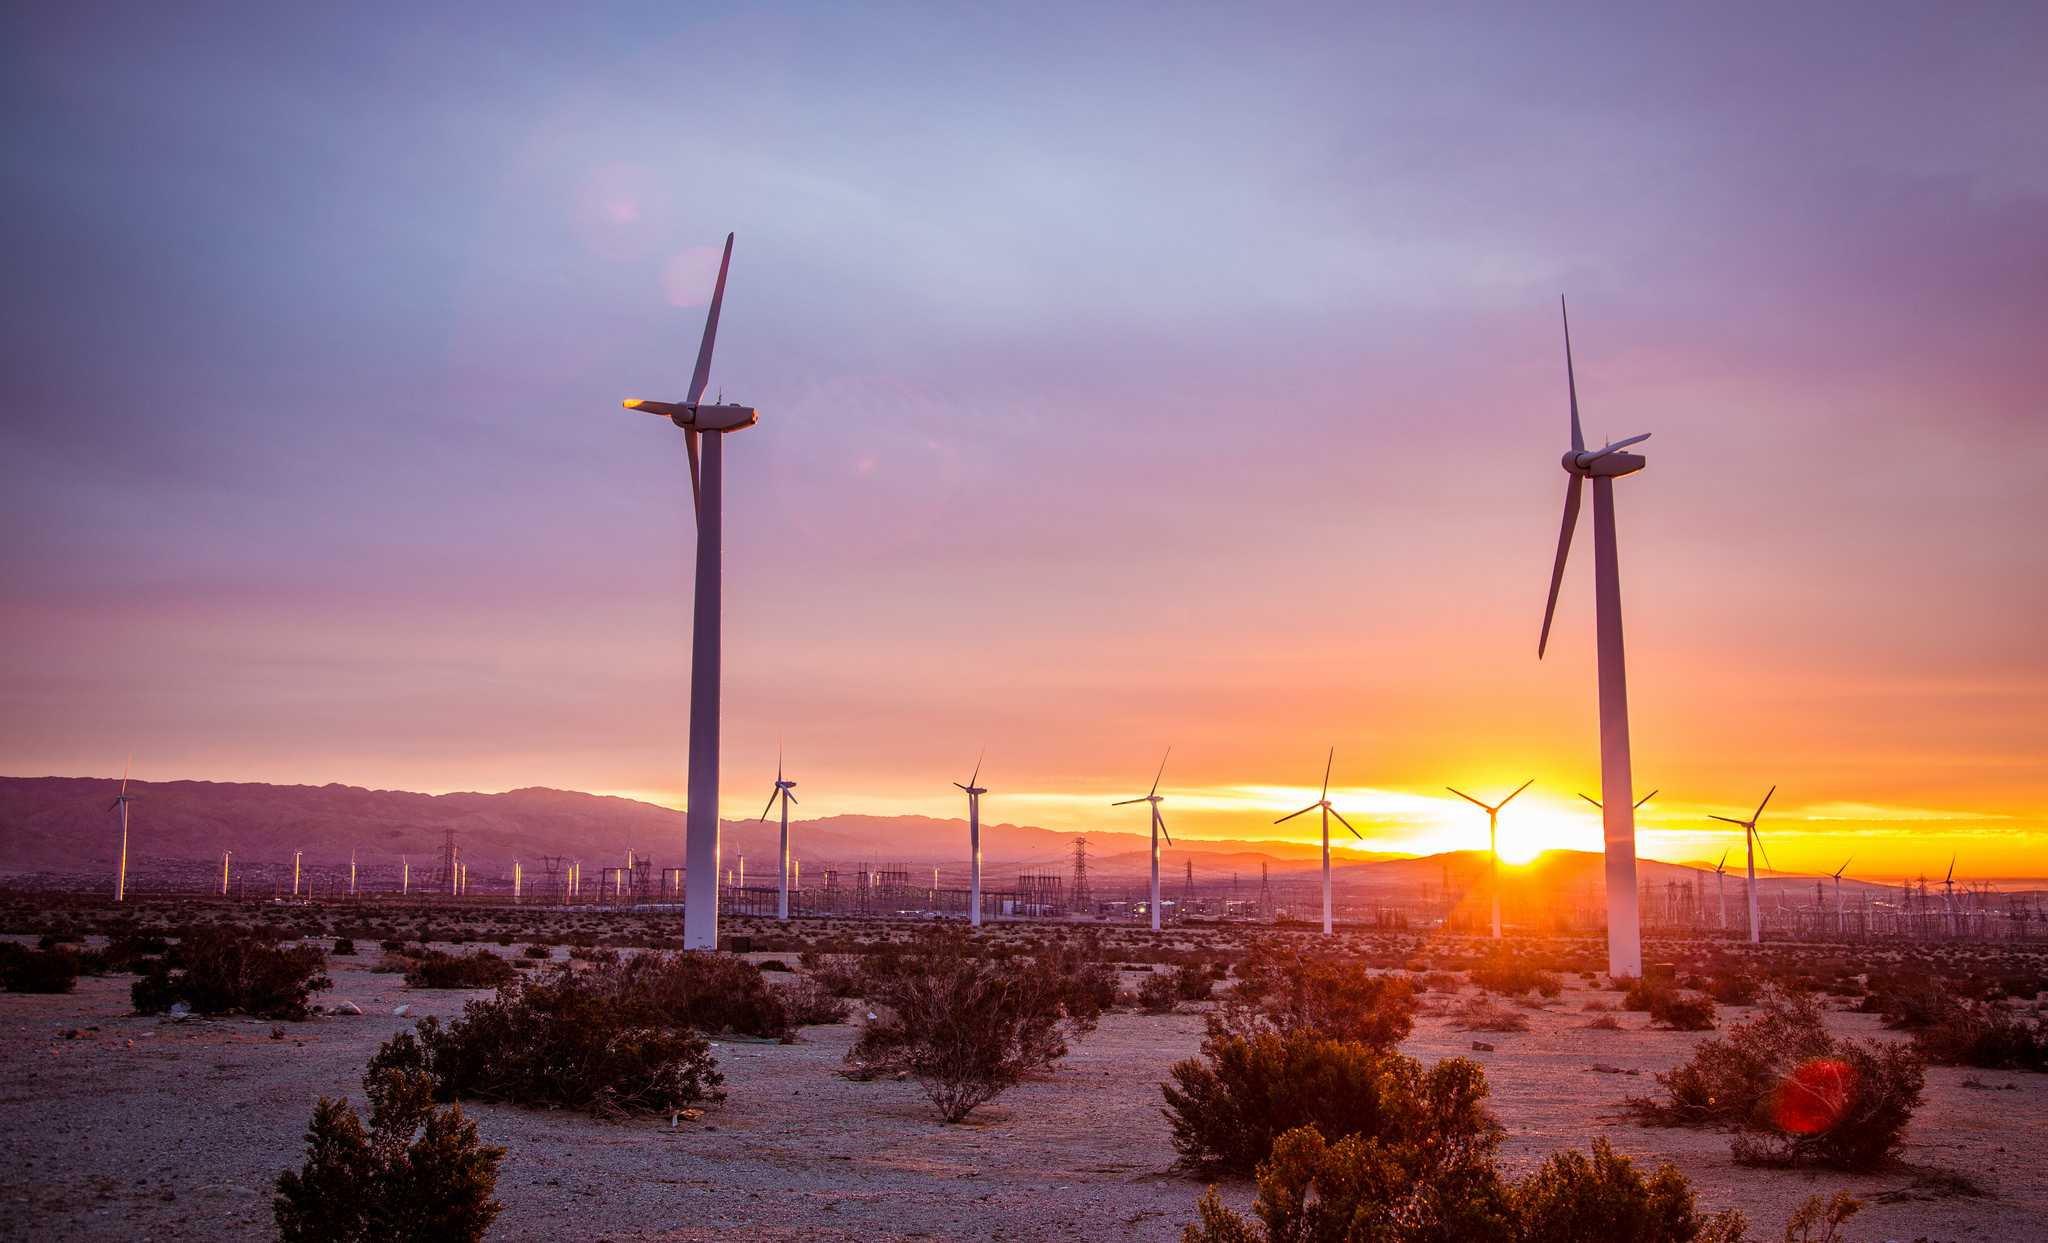 Energy windmills similar to Ochoa's windmill patent